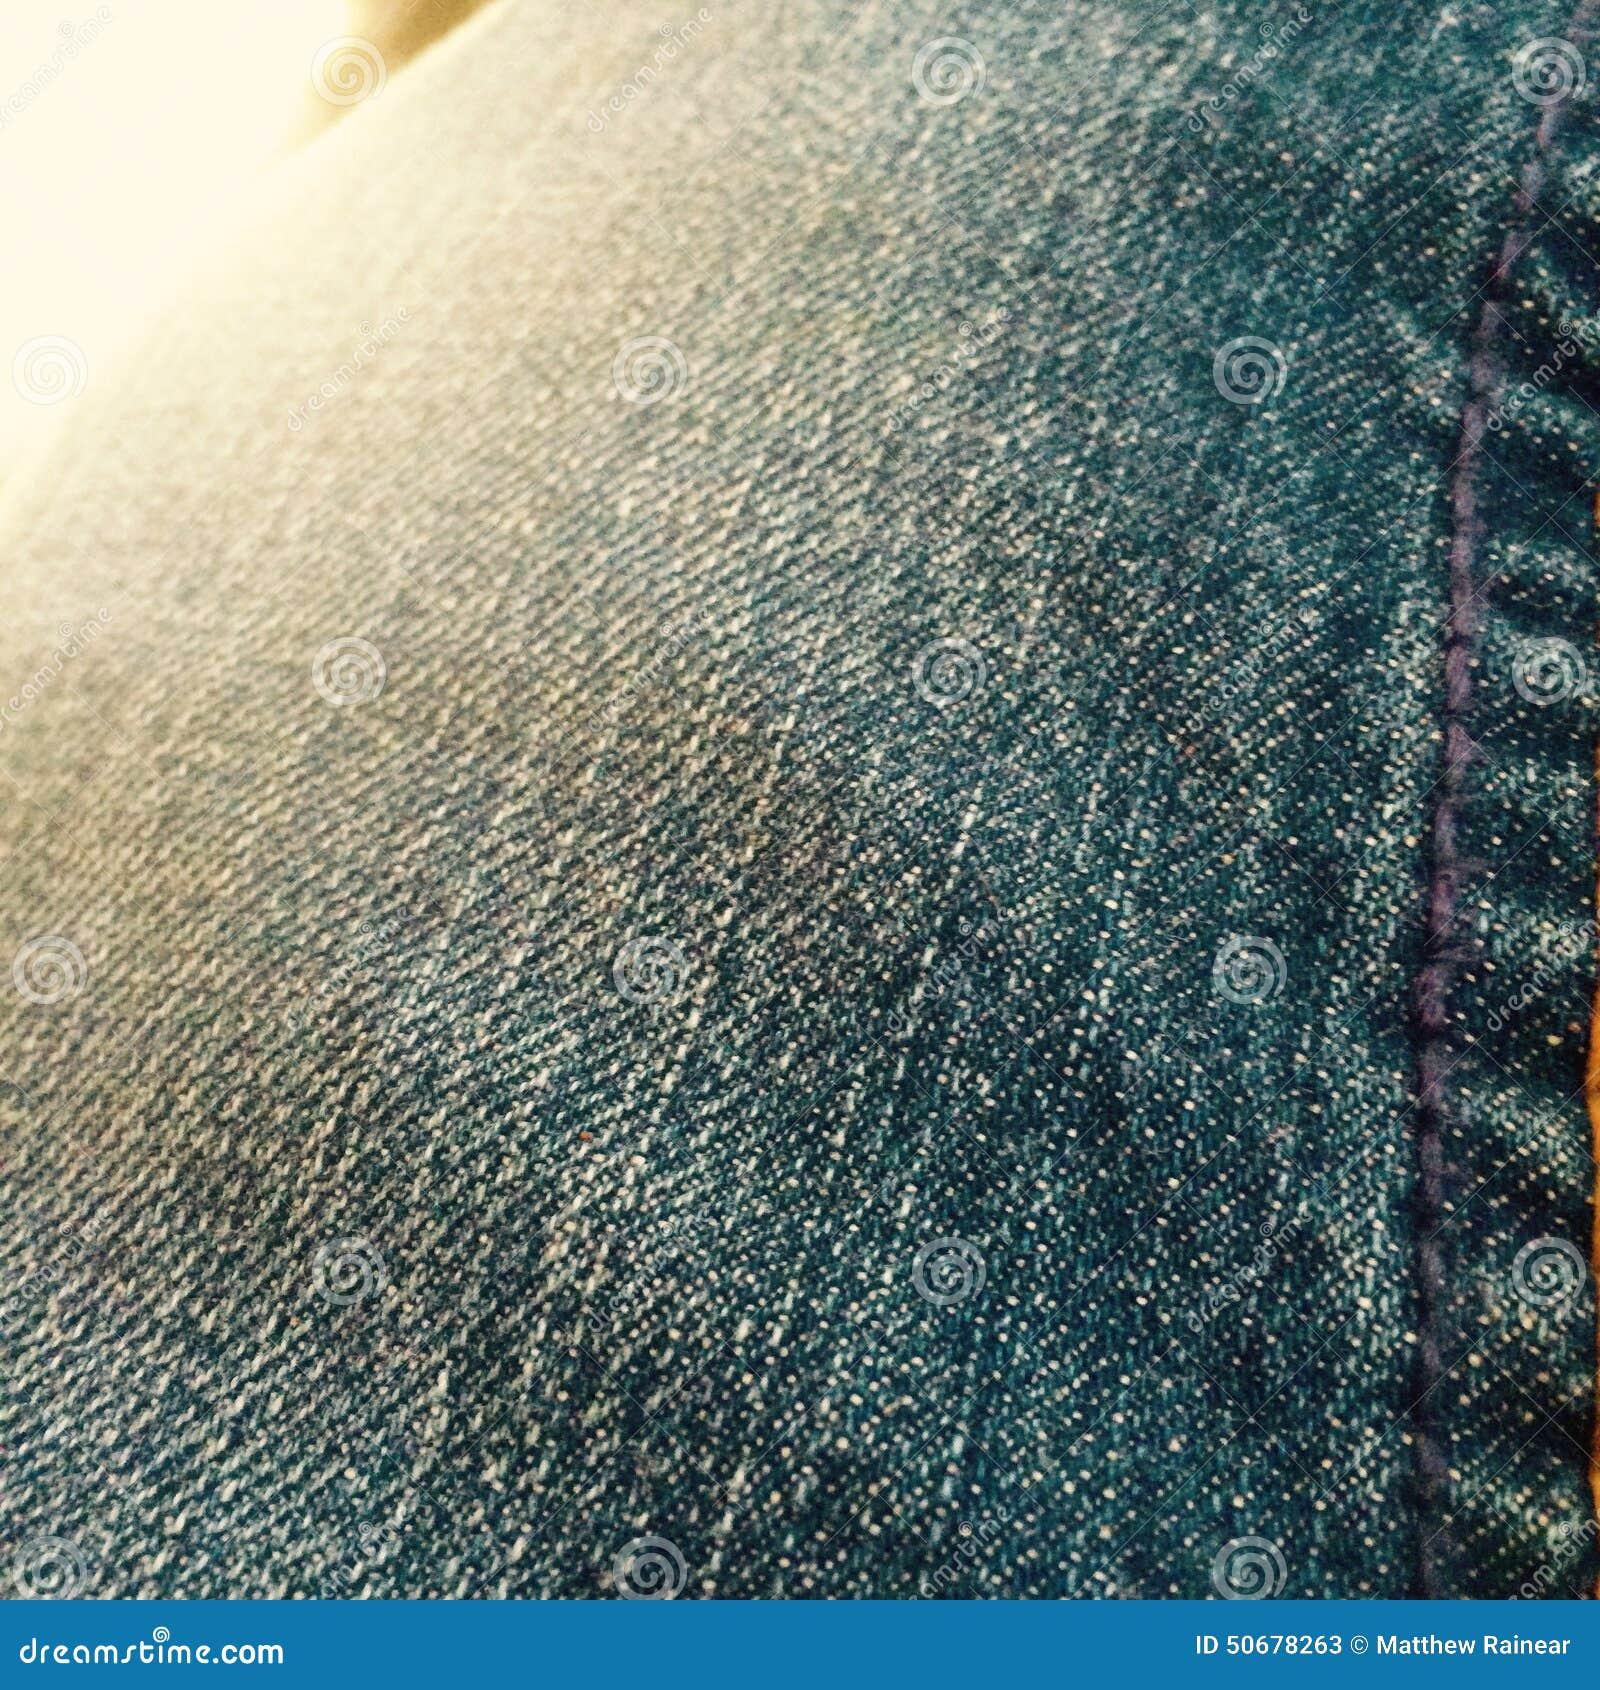 Download 牛仔裤 库存图片. 图片 包括有 红色, 朦胧, 户外, 天空, 原野, 牛仔裤, 轻武装快舰, 超级, 结构树 - 50678263